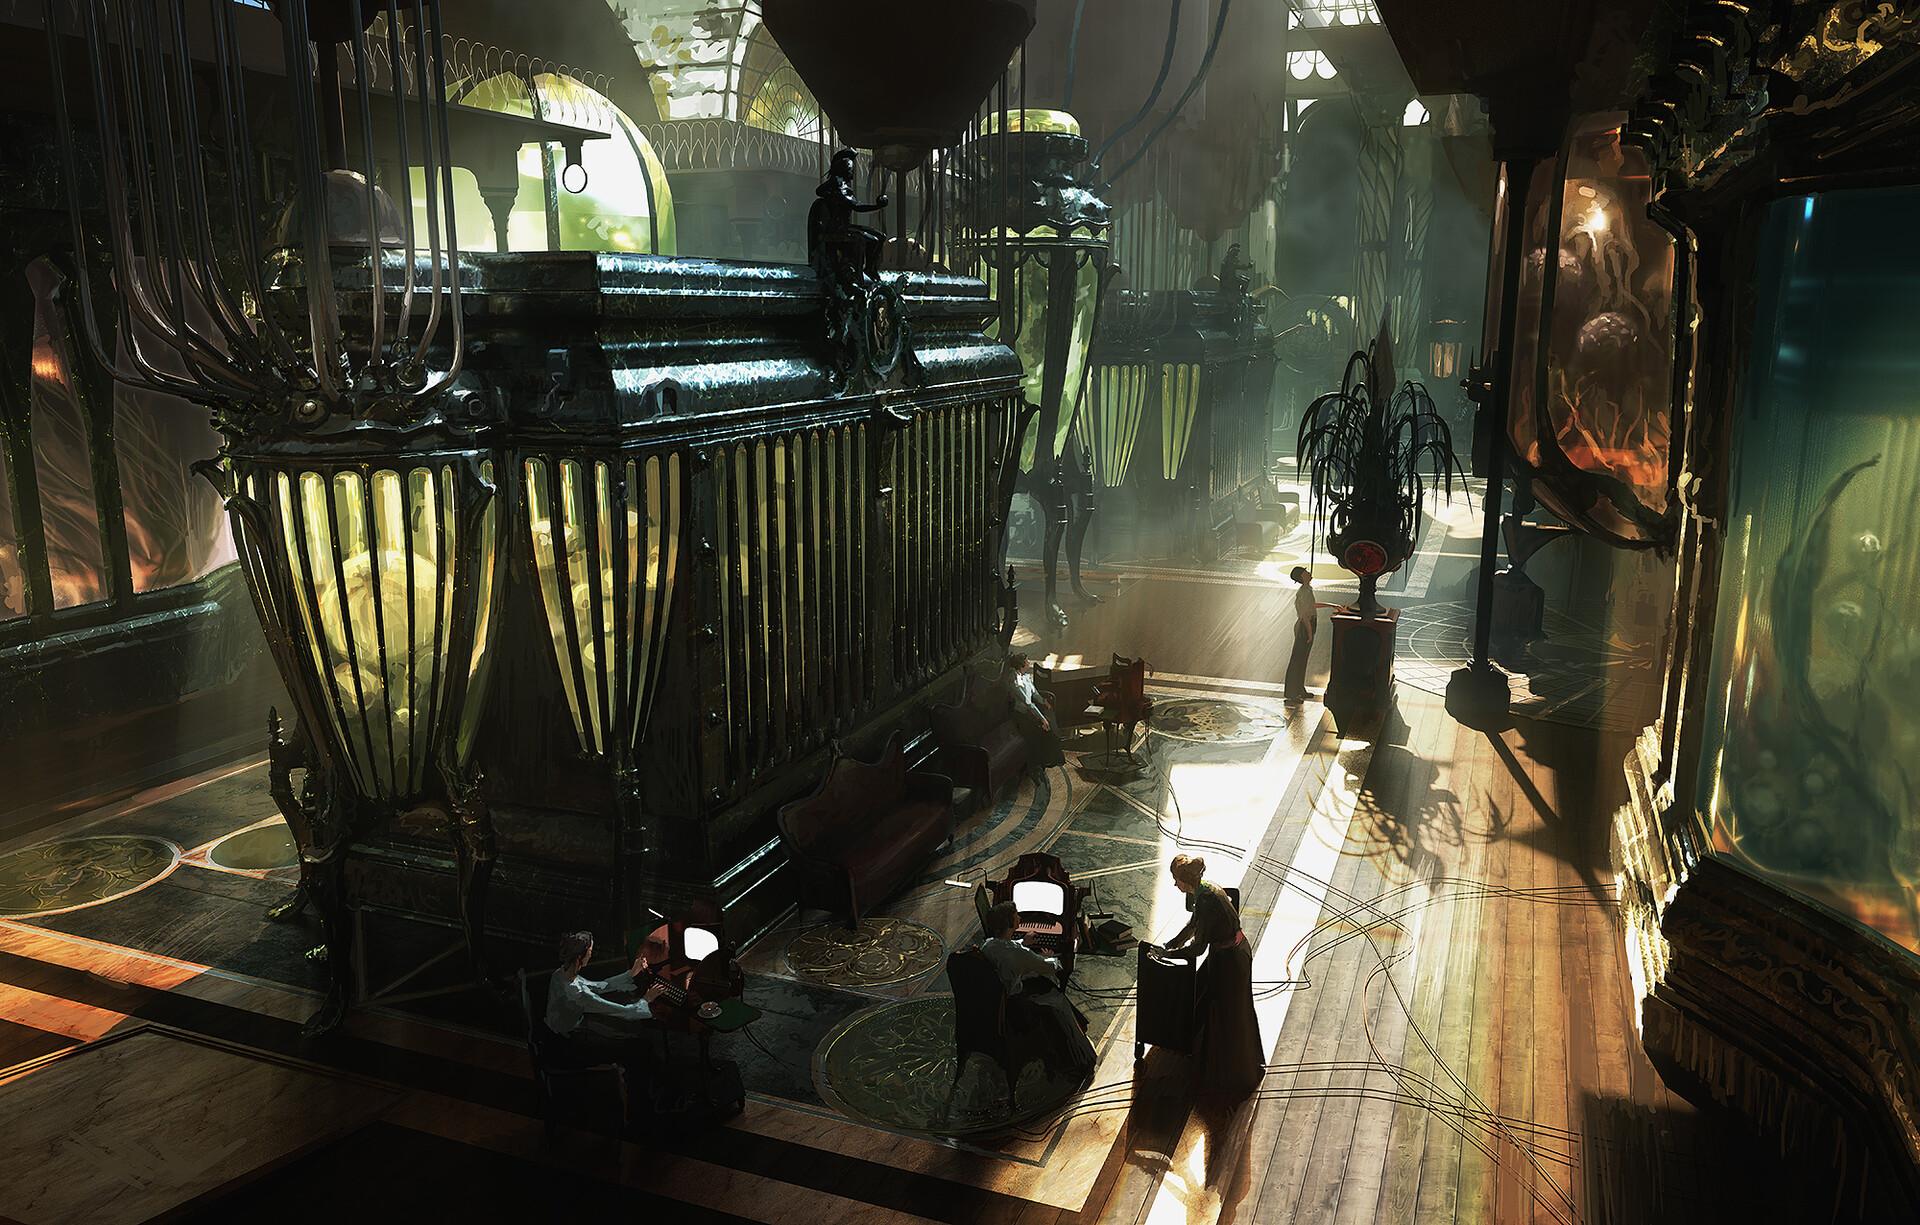 The Sci-Fi & Fantasy Artworks of Pete Amachree